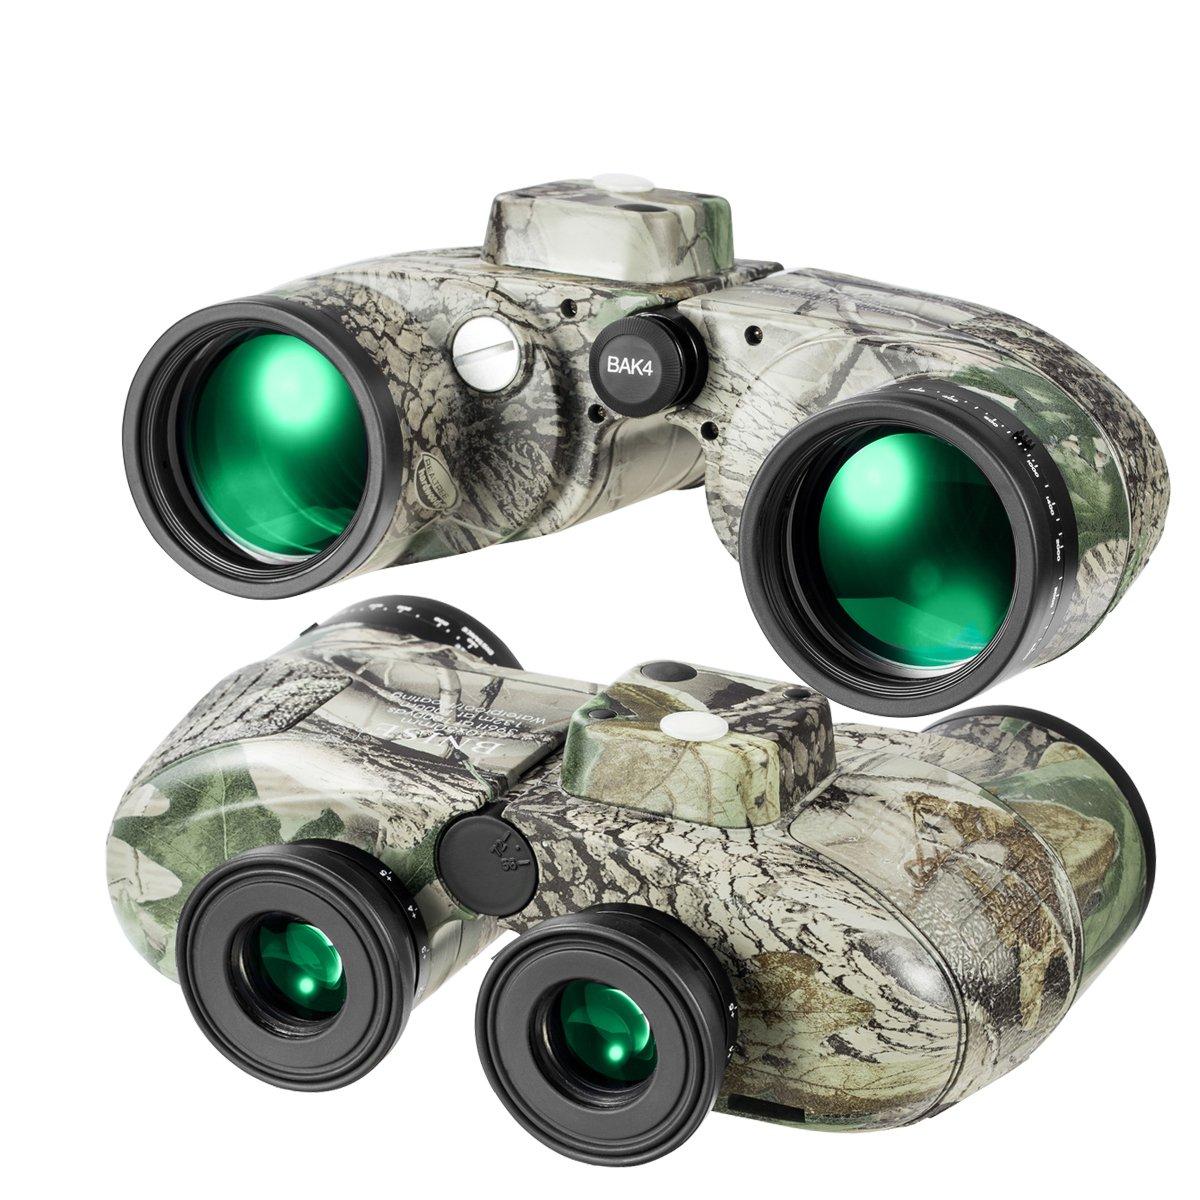 Military Binoculars pic-5